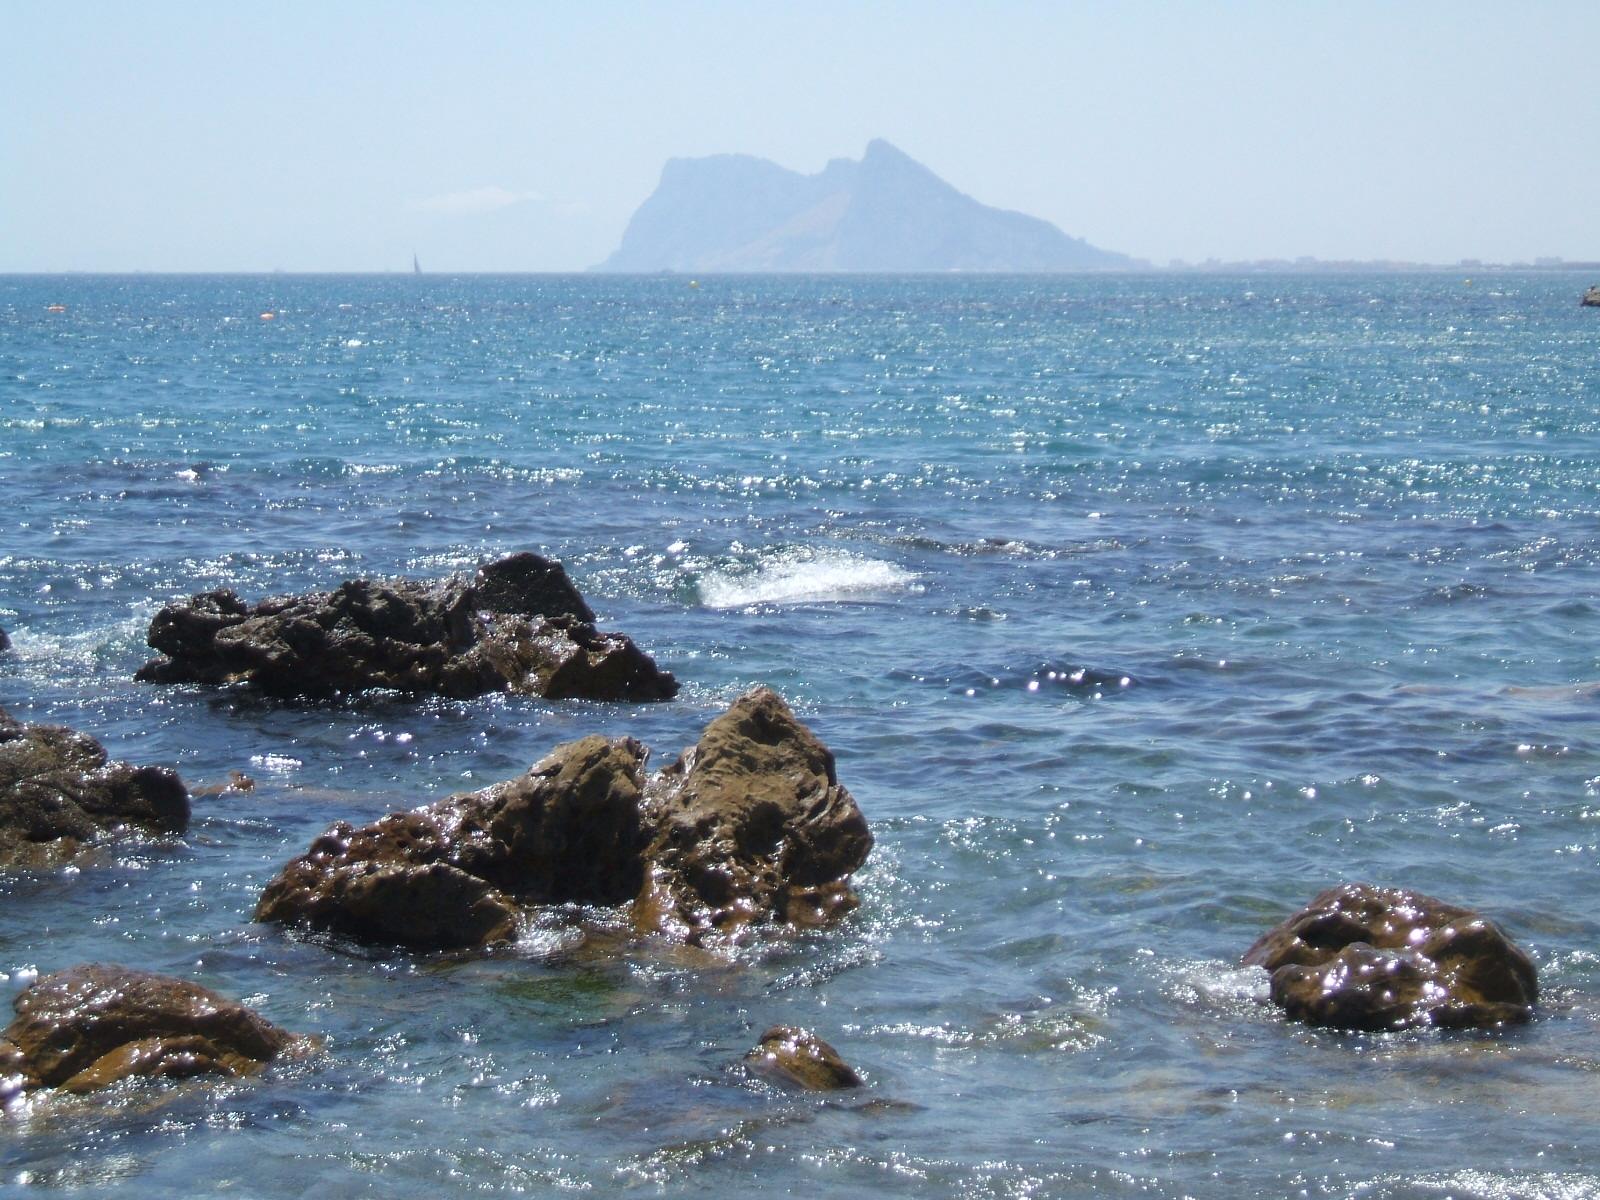 Playa Torrecarbonera / El Balneario